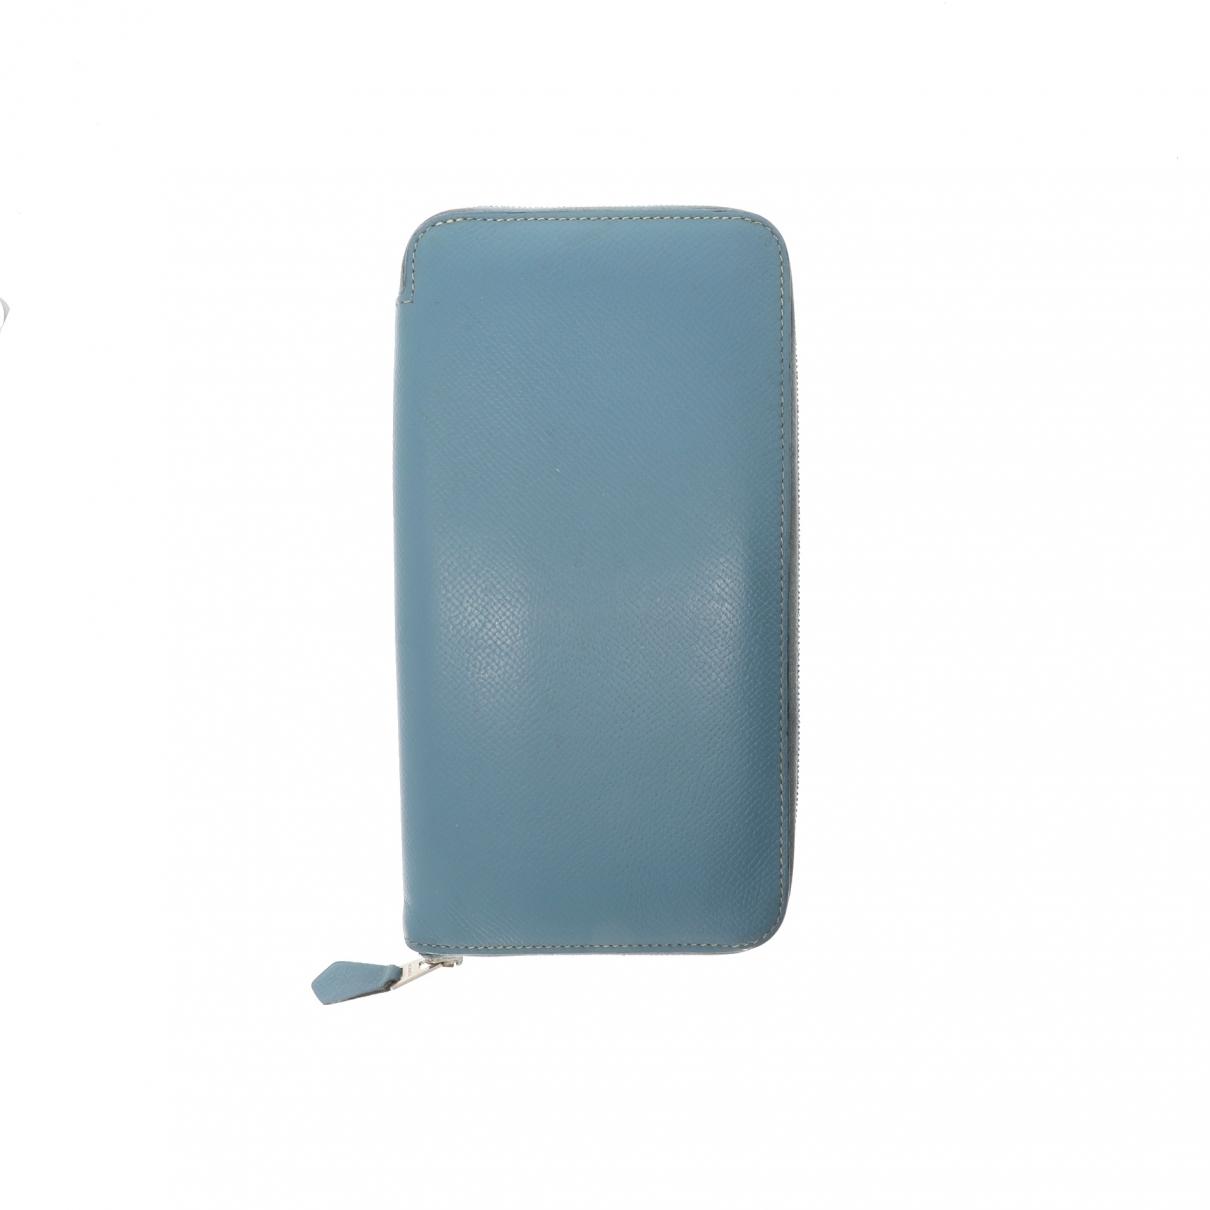 Hermes Azap Portemonnaie in  Blau Leder